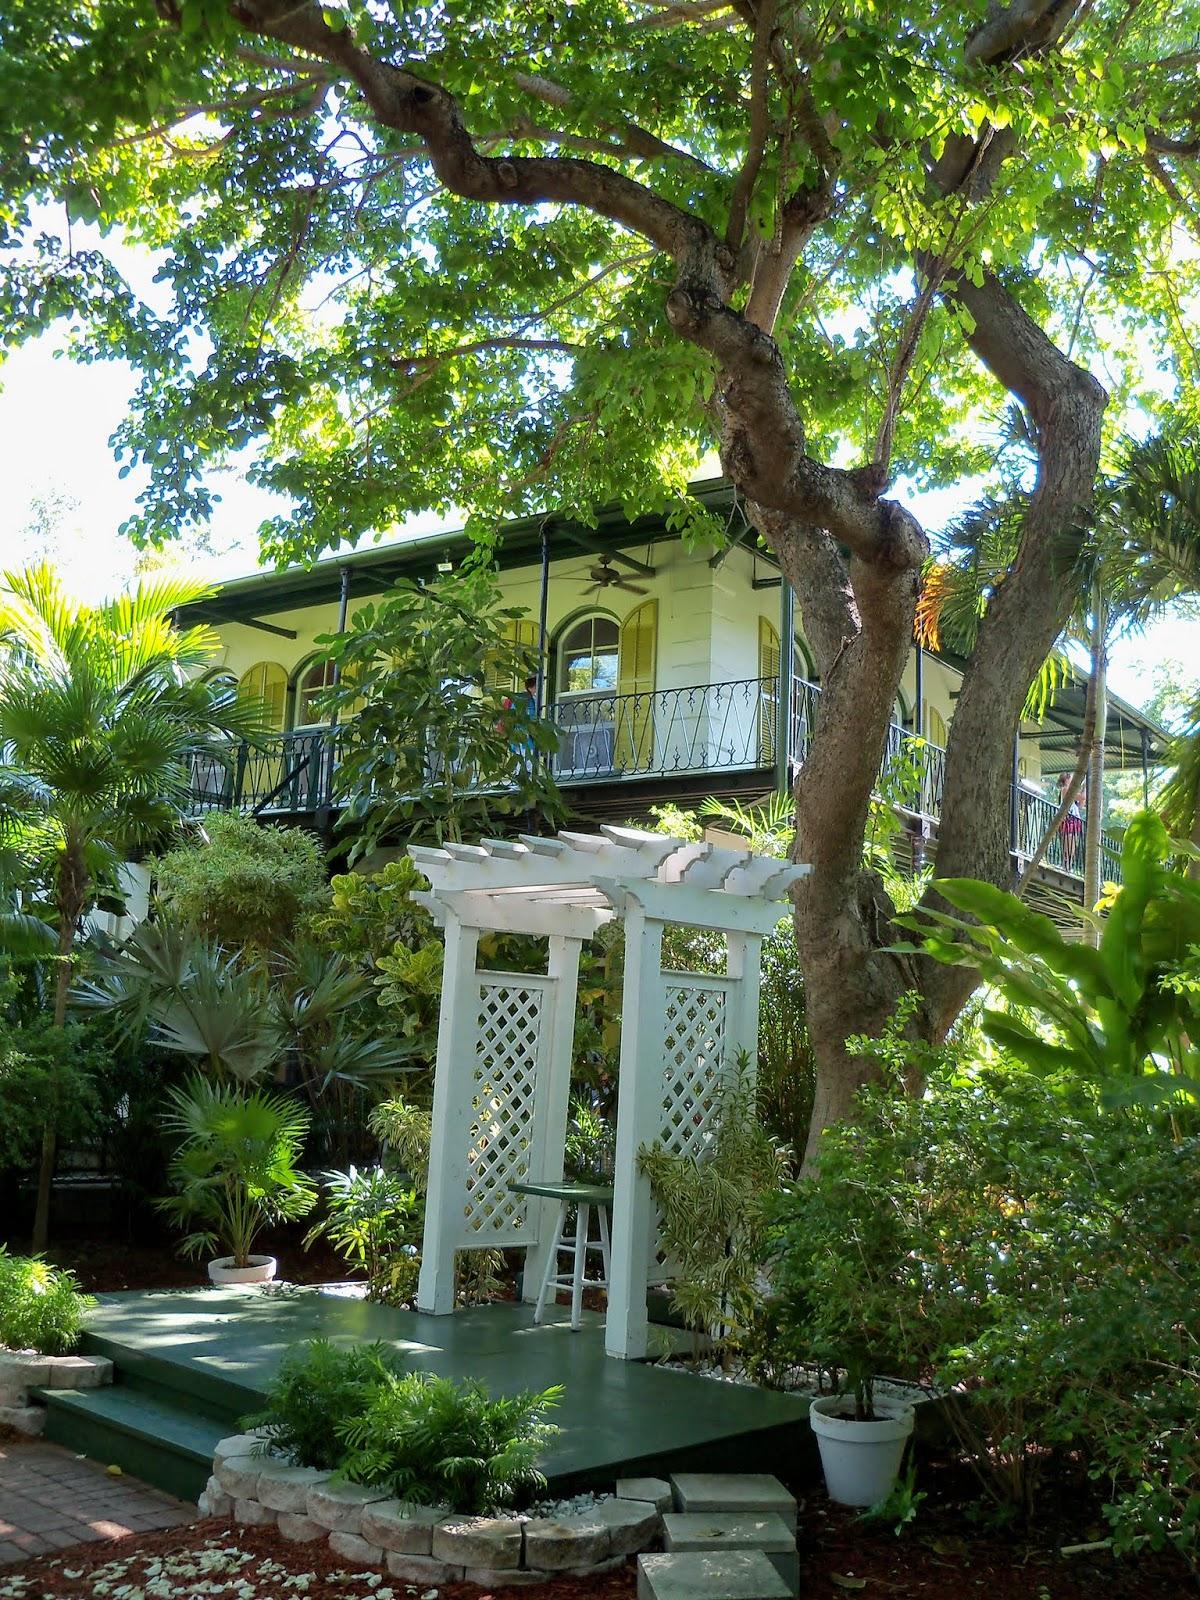 Key West Vacation - 116_5463.JPG